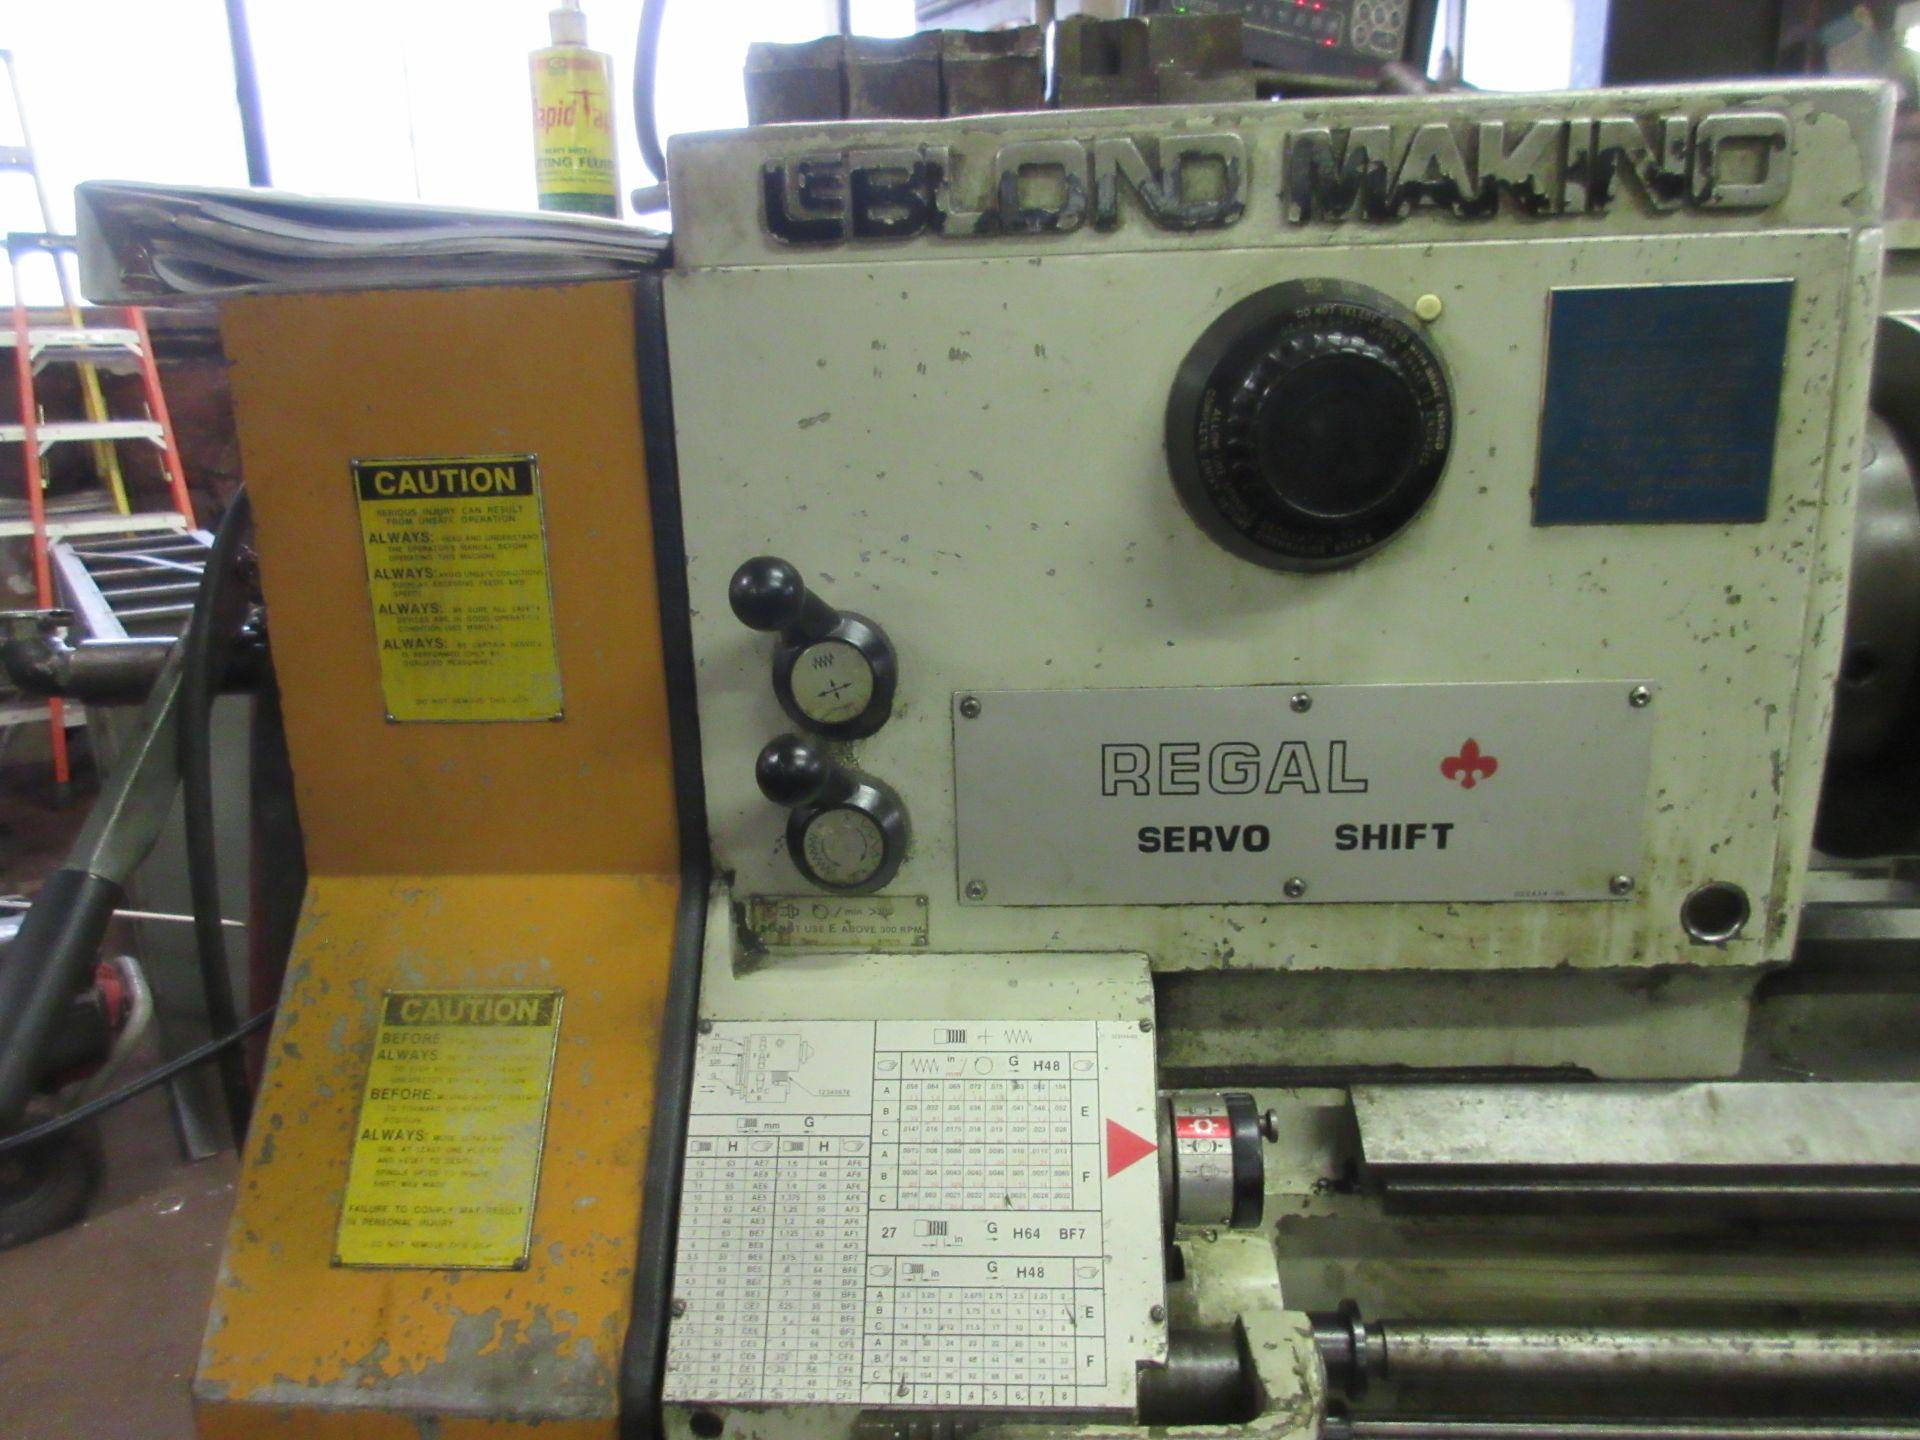 "(1) Leblond Makino Regal Servo Shift Toolroom Lathe S/N 15E-325 72"" Long W/3"" Spindle Hole (1) - Image 2 of 6"